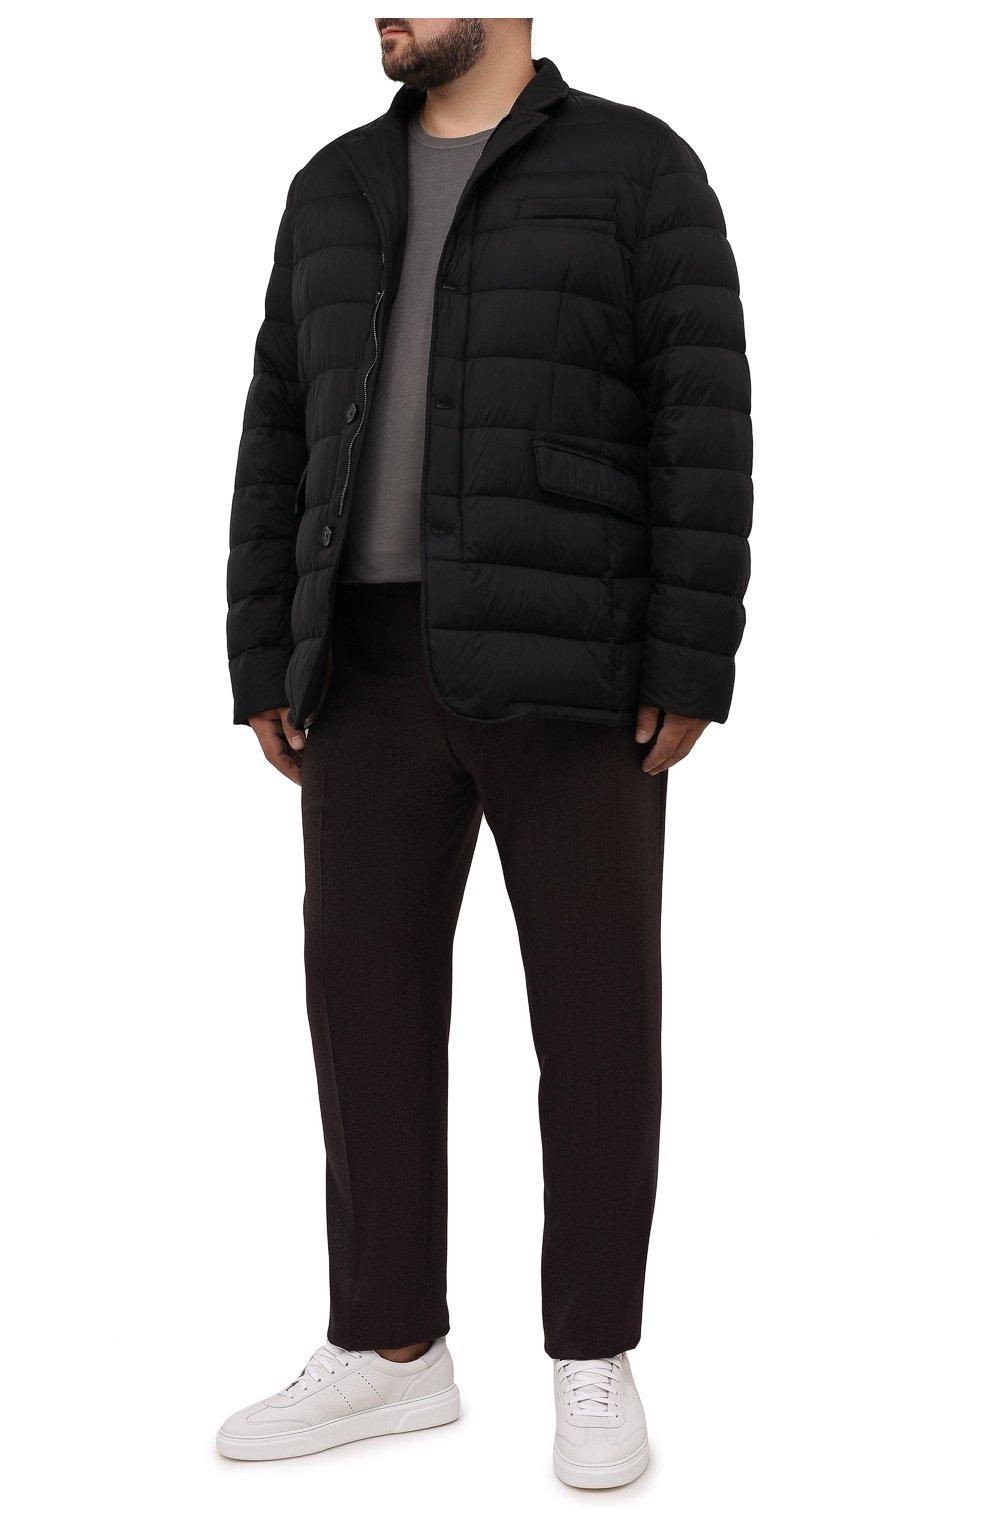 Мужская пуховая куртка zayn-op MOORER черного цвета, арт. ZAYN-0P/M0UGI100307-TEPA017/60-68   Фото 2 (Кросс-КТ: Куртка, Пуховик; Мужское Кросс-КТ: пуховик-короткий; Рукава: Длинные; Материал внешний: Синтетический материал; Стили: Классический; Материал подклада: Синтетический материал)